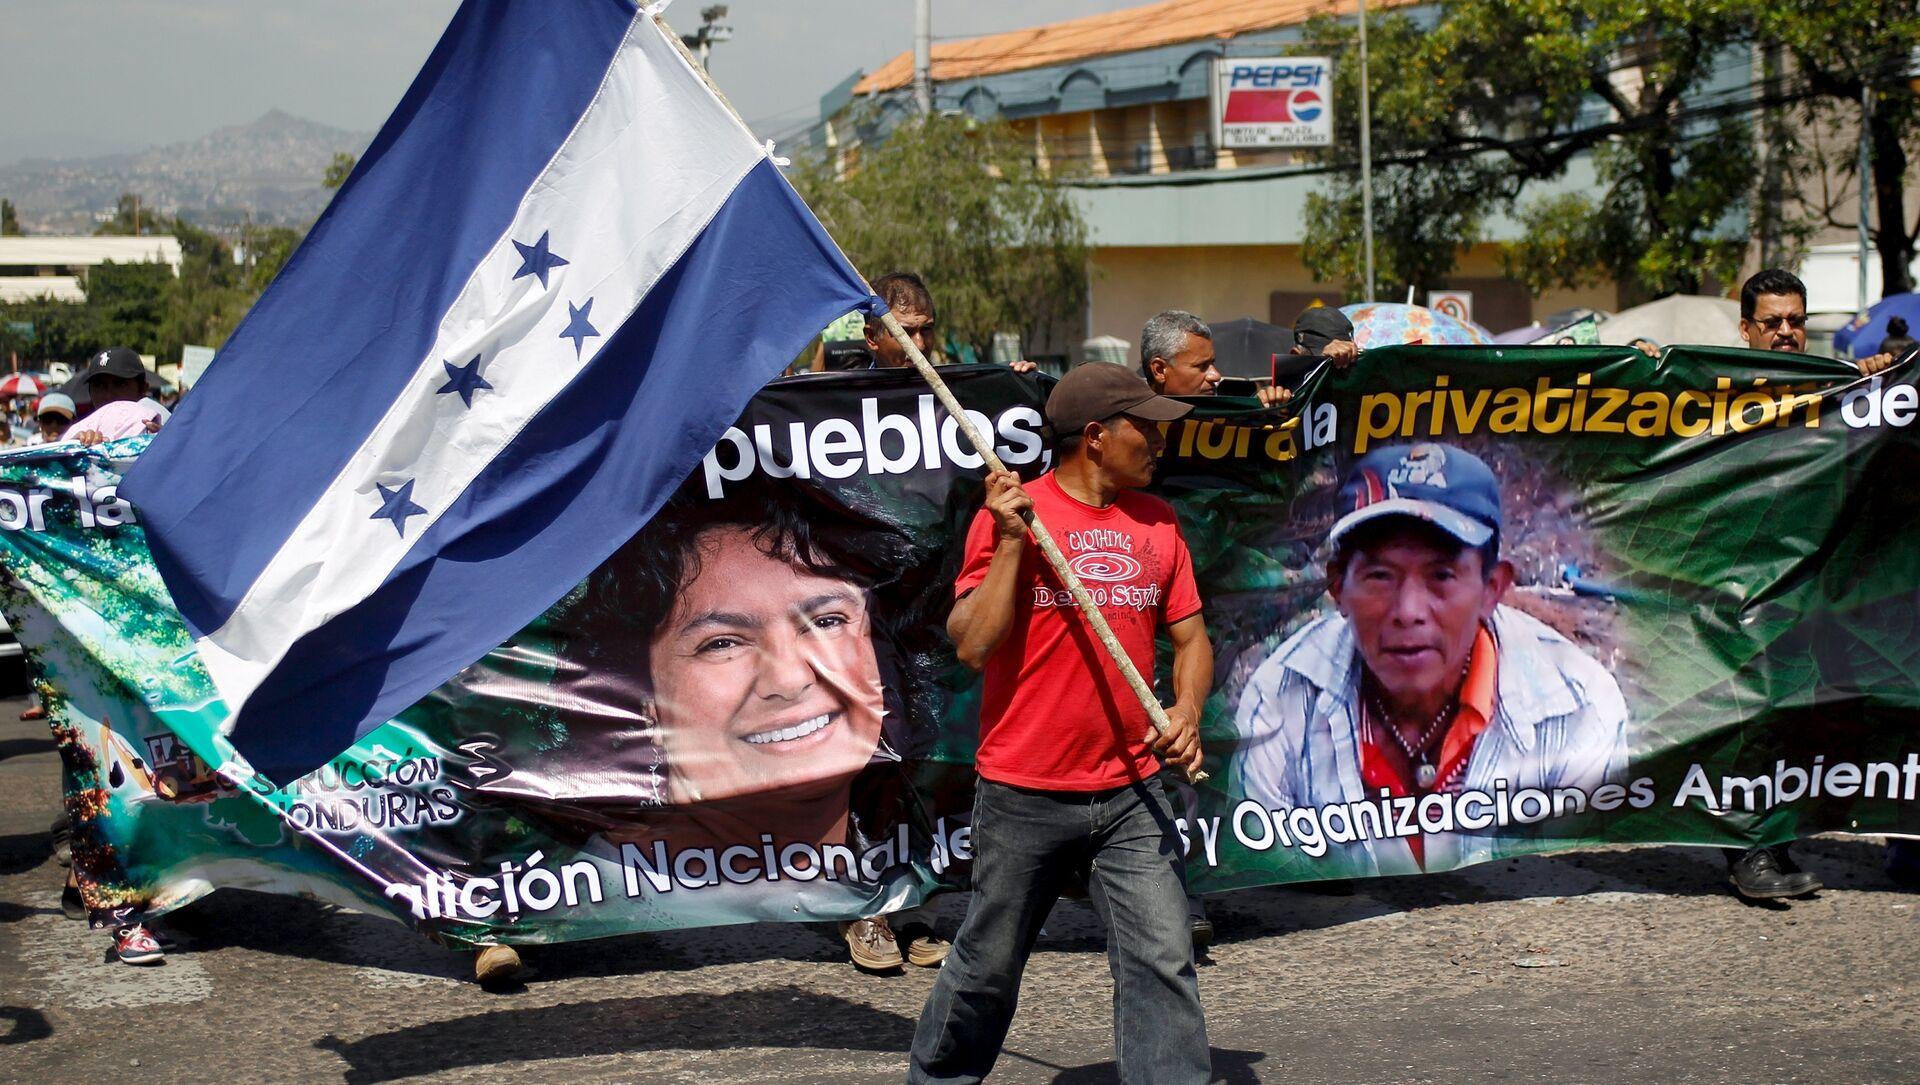 Protesta en Honduras reclamando justicia para Berta Cáceres - Sputnik Mundo, 1920, 03.12.2019